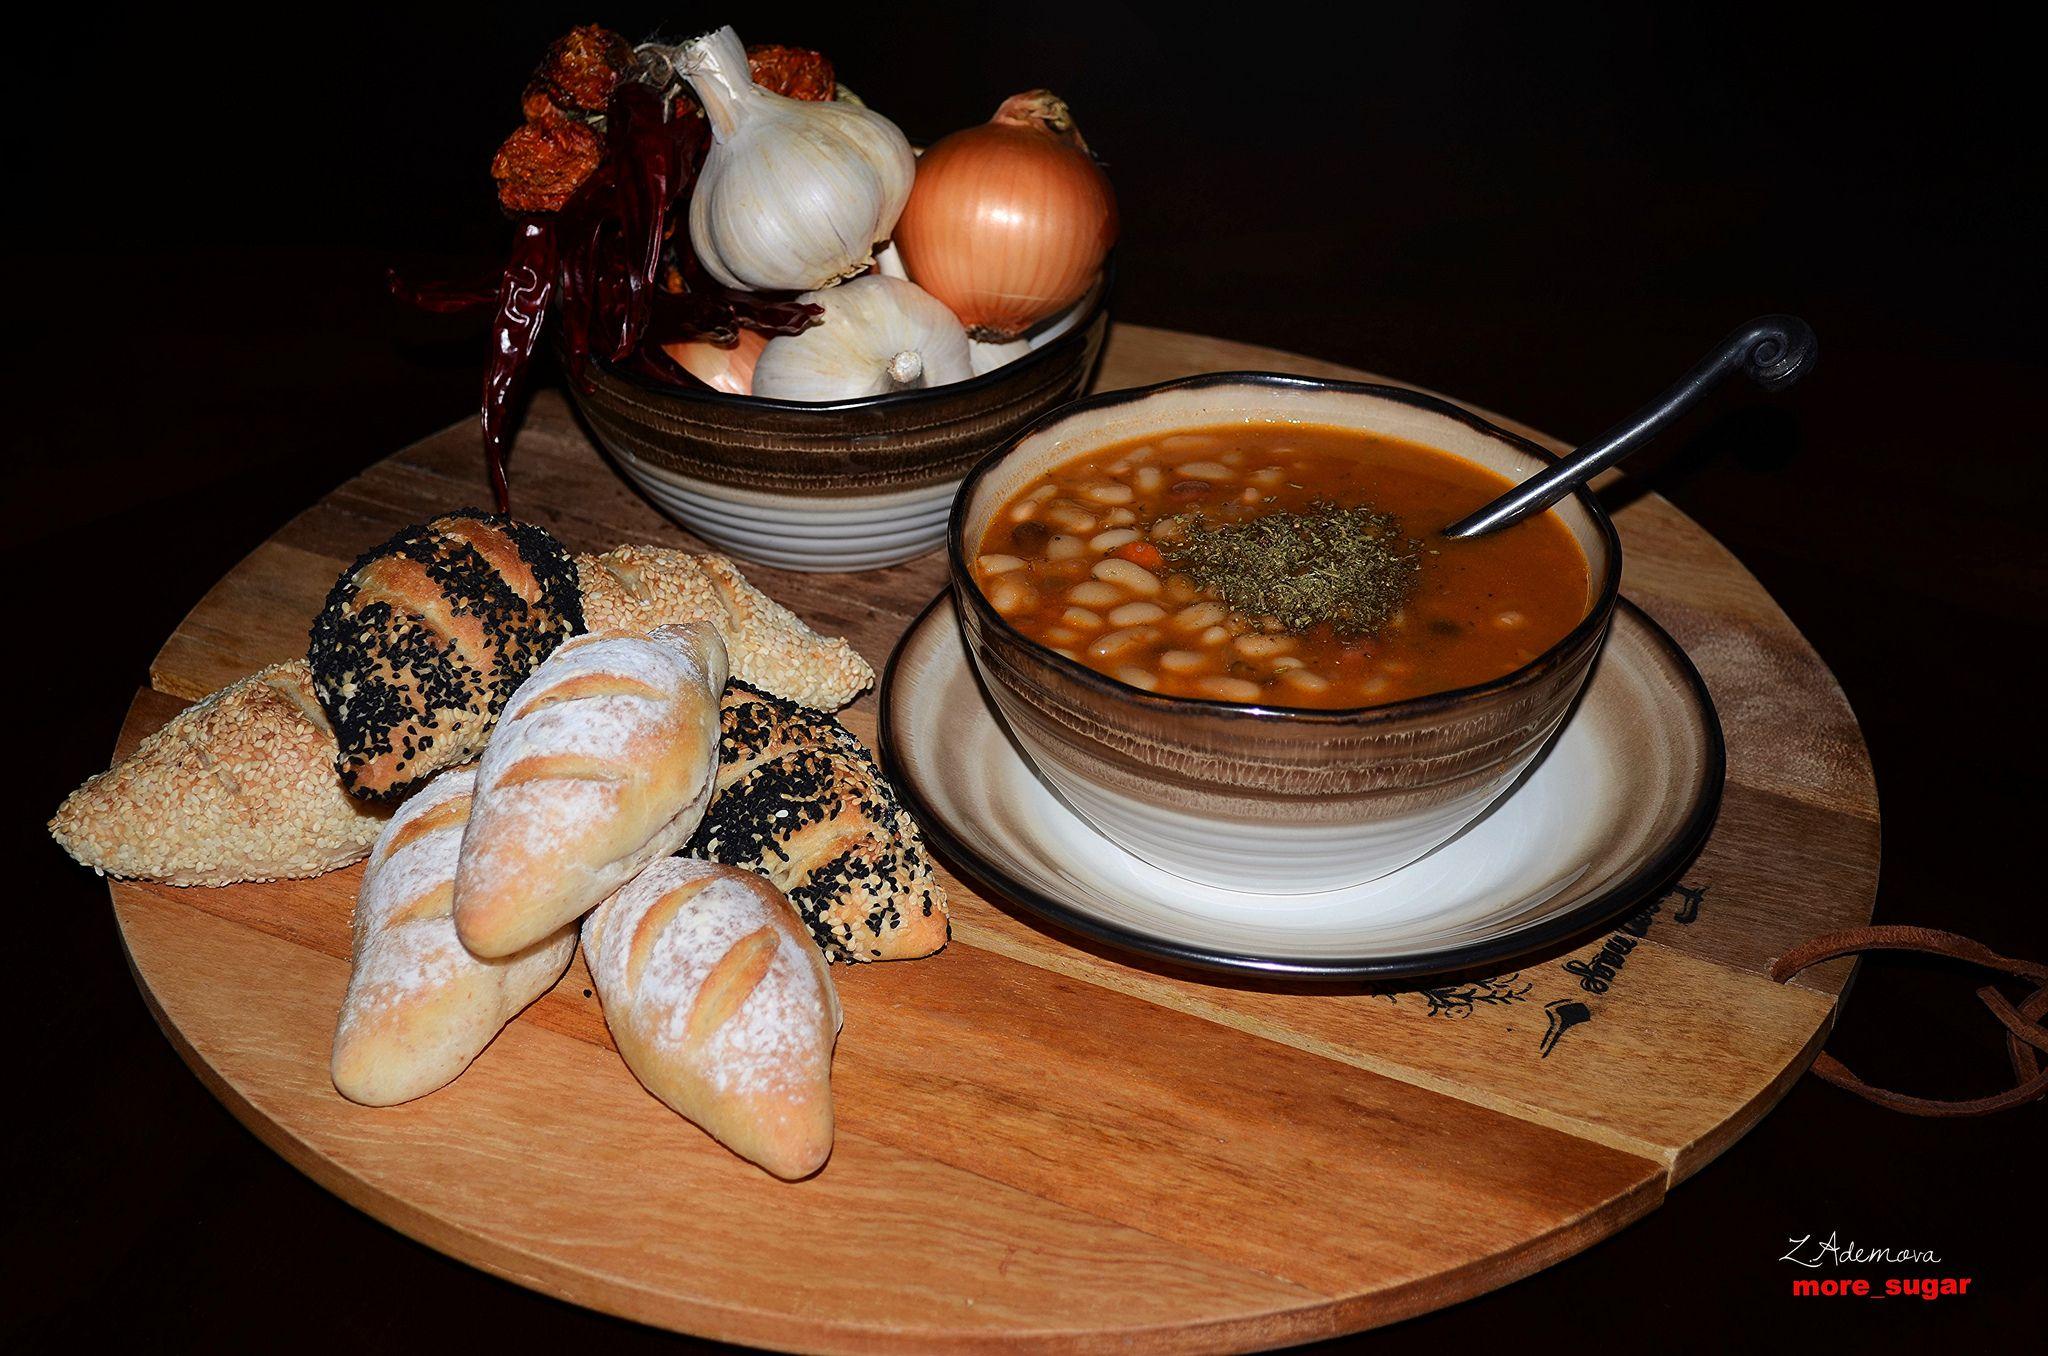 https://flic.kr/p/DACQiA | Beans soup